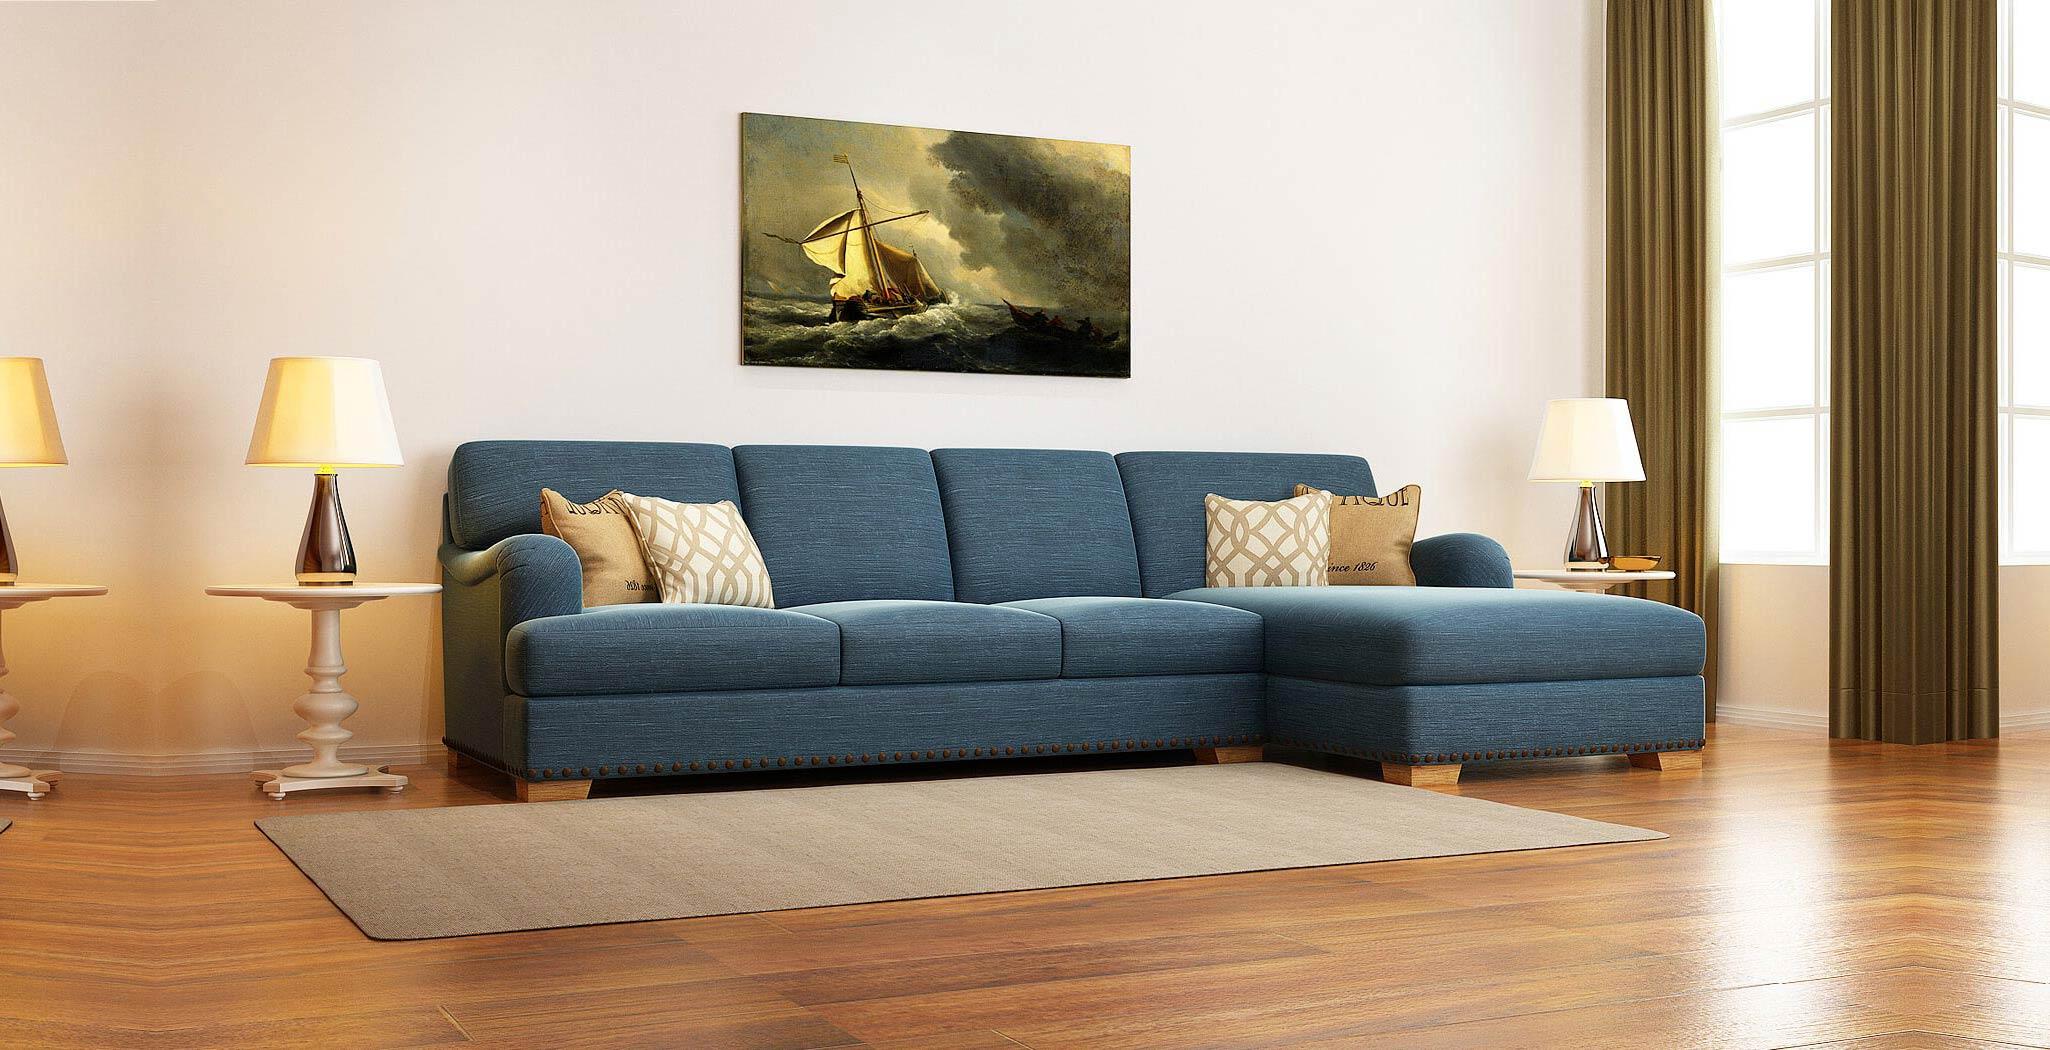 brighton panel furniture gallery 2